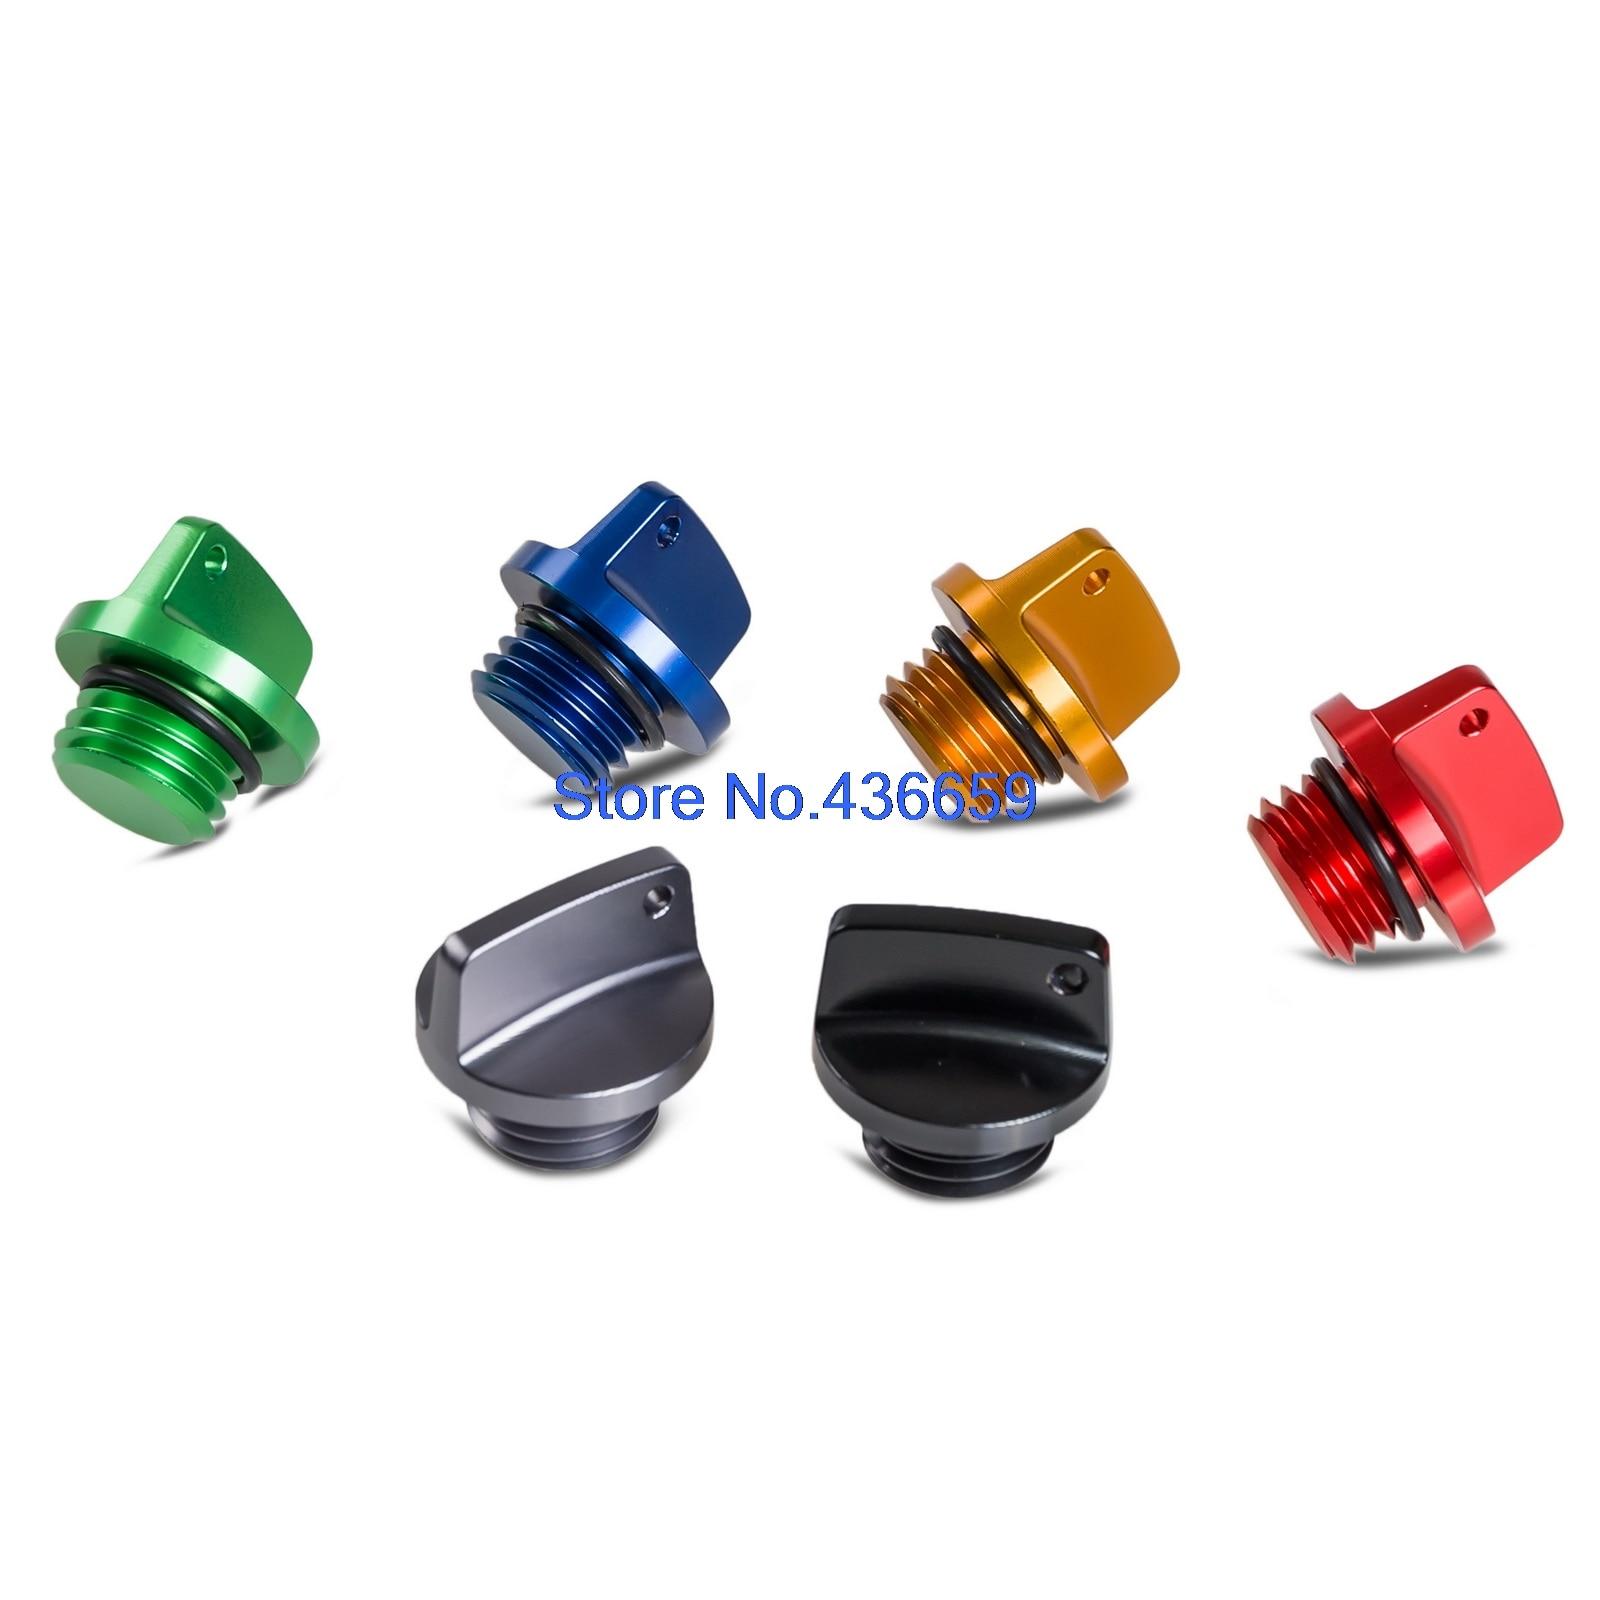 CNC Oil Filler Cap Plug For Kawasaki ER4N ER6F ER-6F ER6N ER-6N Ninja 400R 600R 650R Z800 Z1000 ZXR750 Versys 650 1000 CNC Oil Filler Cap Plug For Kawasaki ER4N ER6F ER-6F ER6N ER-6N Ninja 400R 600R 650R Z800 Z1000 ZXR750 Versys 650 1000